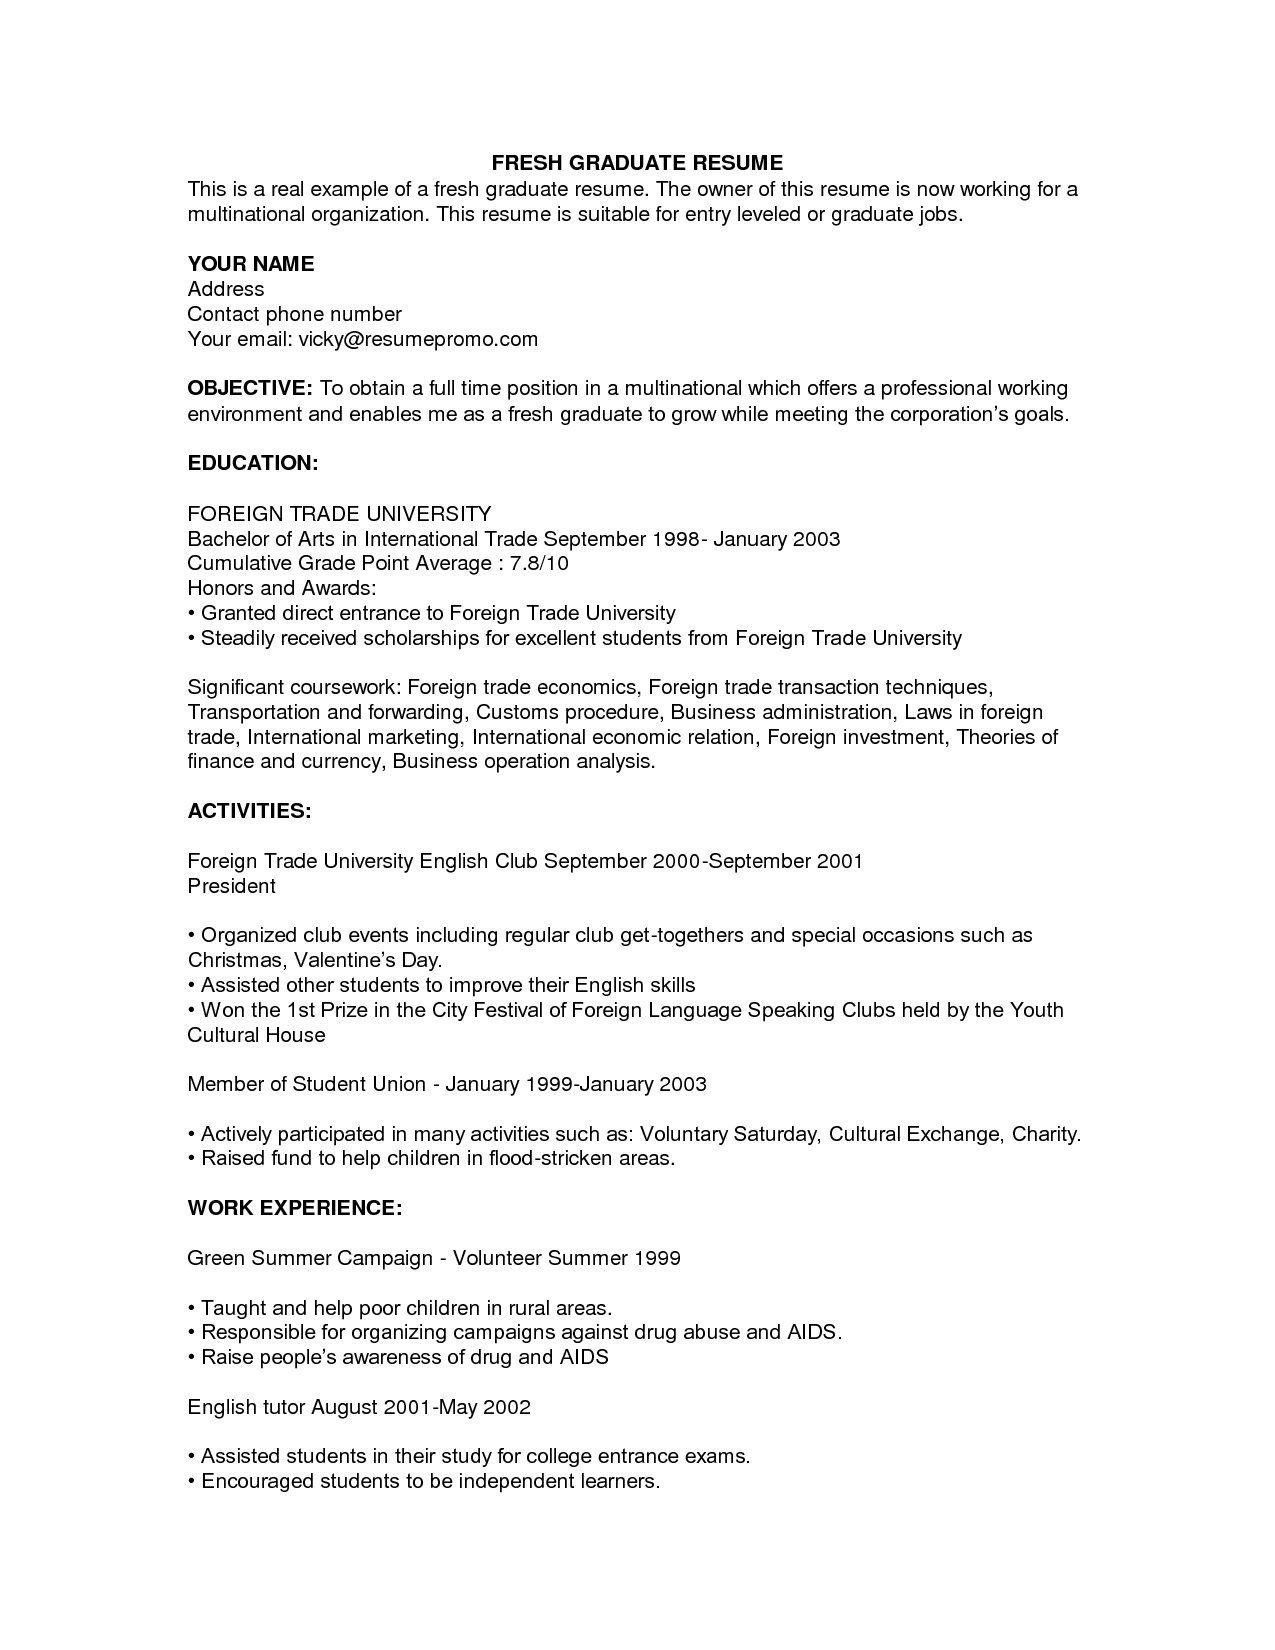 Example Of Resume For Fresh Graduate Jobresumesample Com